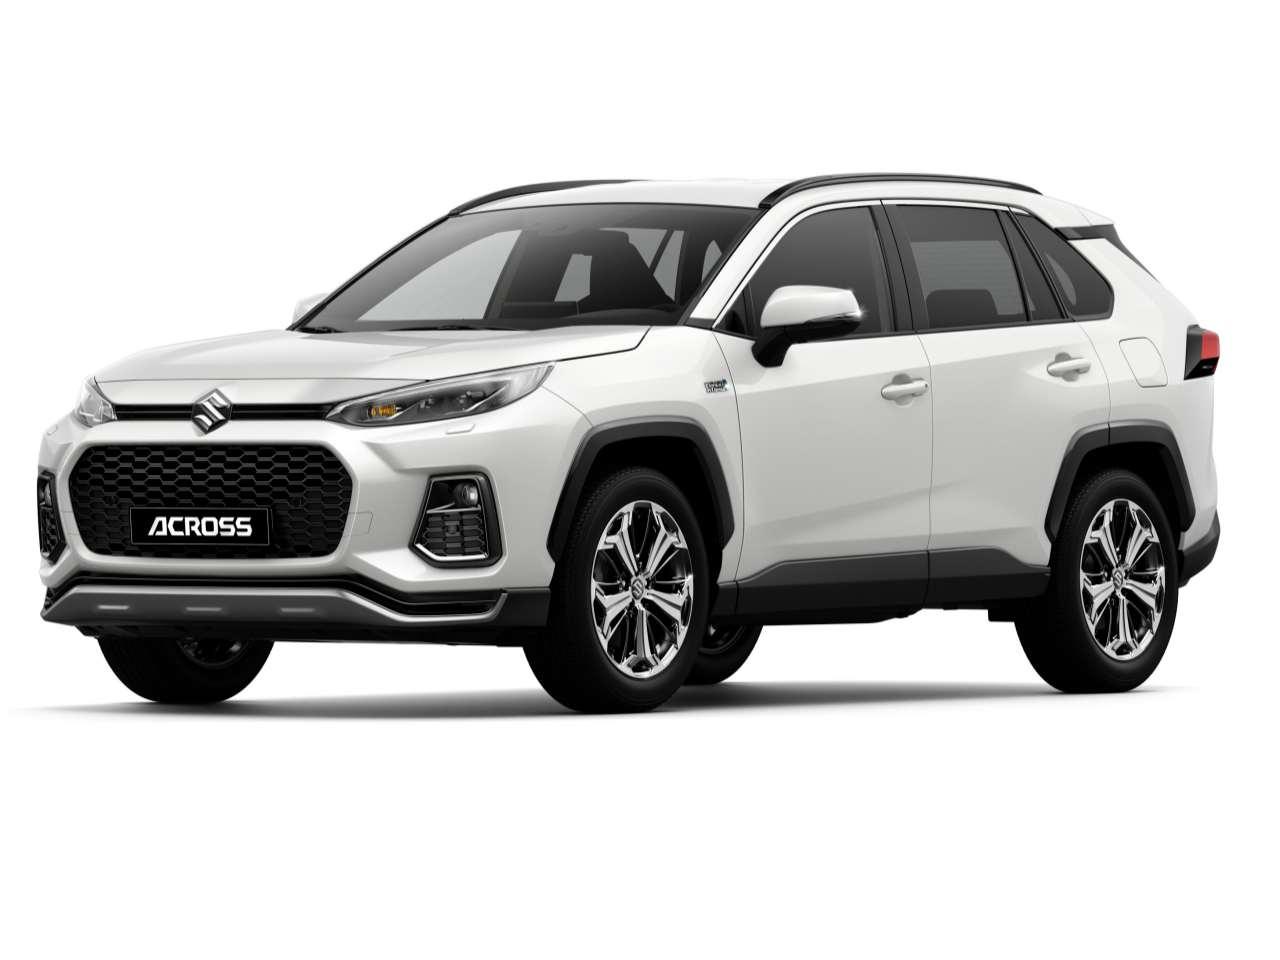 Prueba AutoFM: Suzuki Across